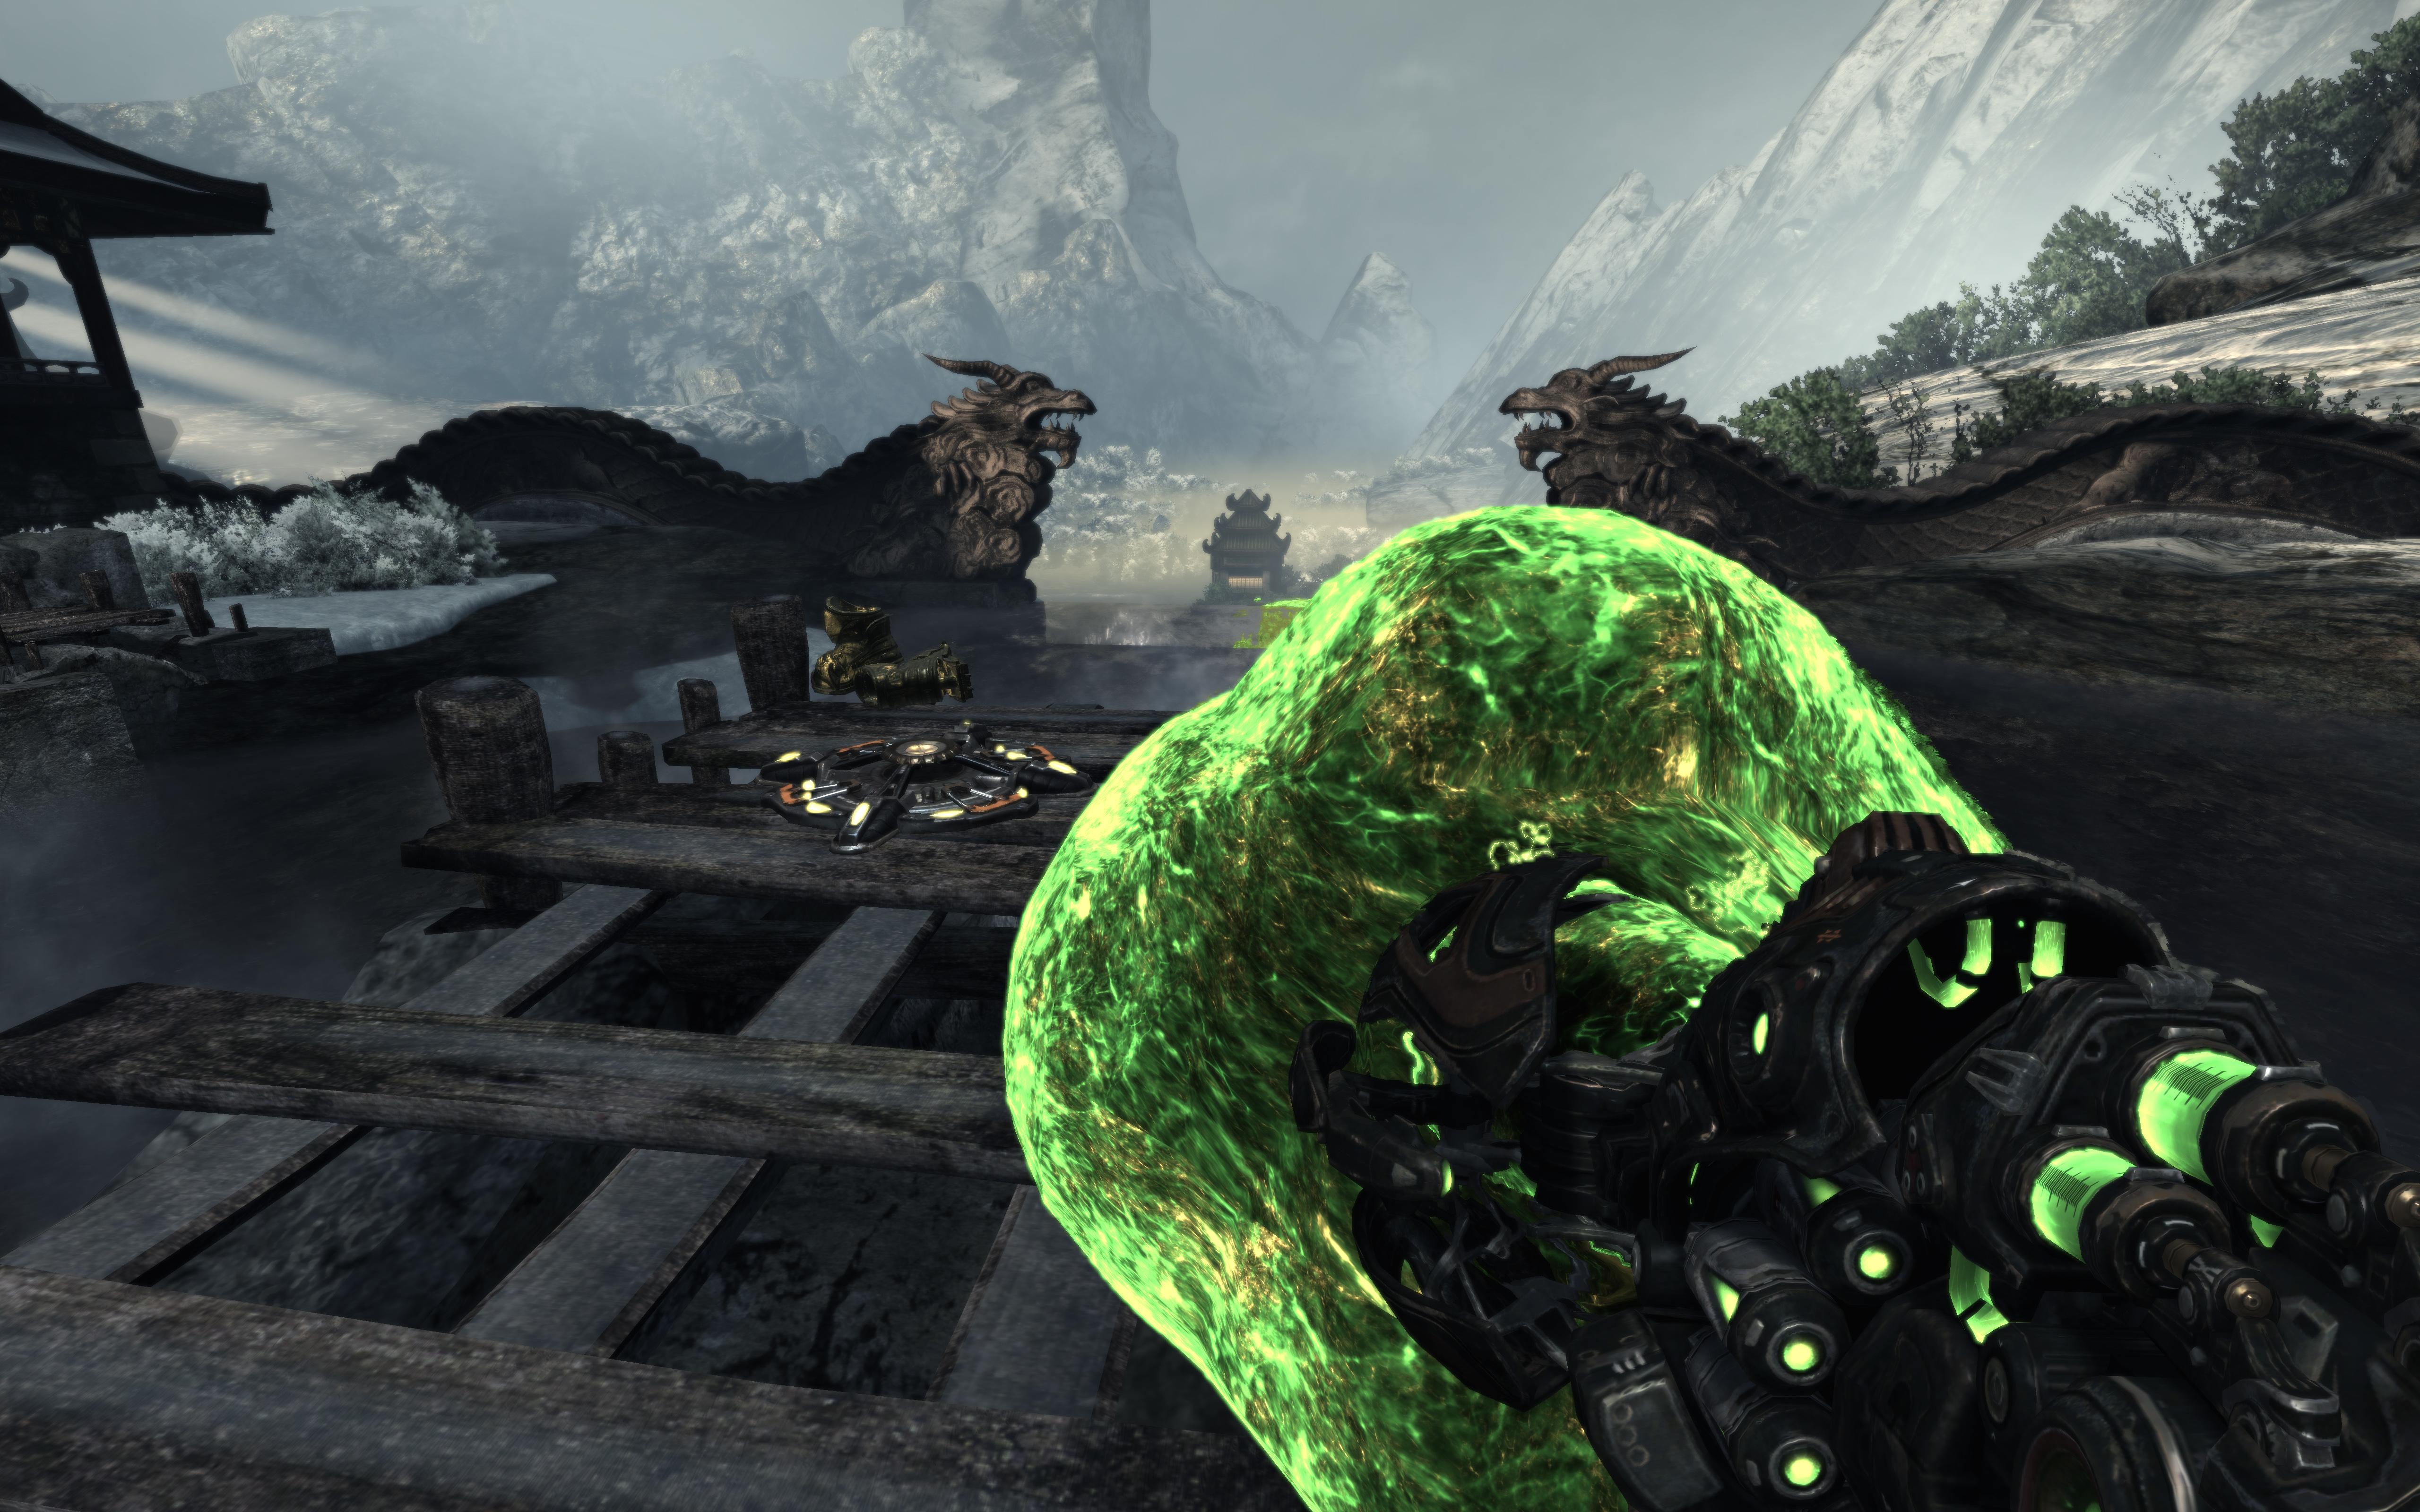 5120x3200 resolution screenshots inside epic games forums - 5120x3200 resolution ...